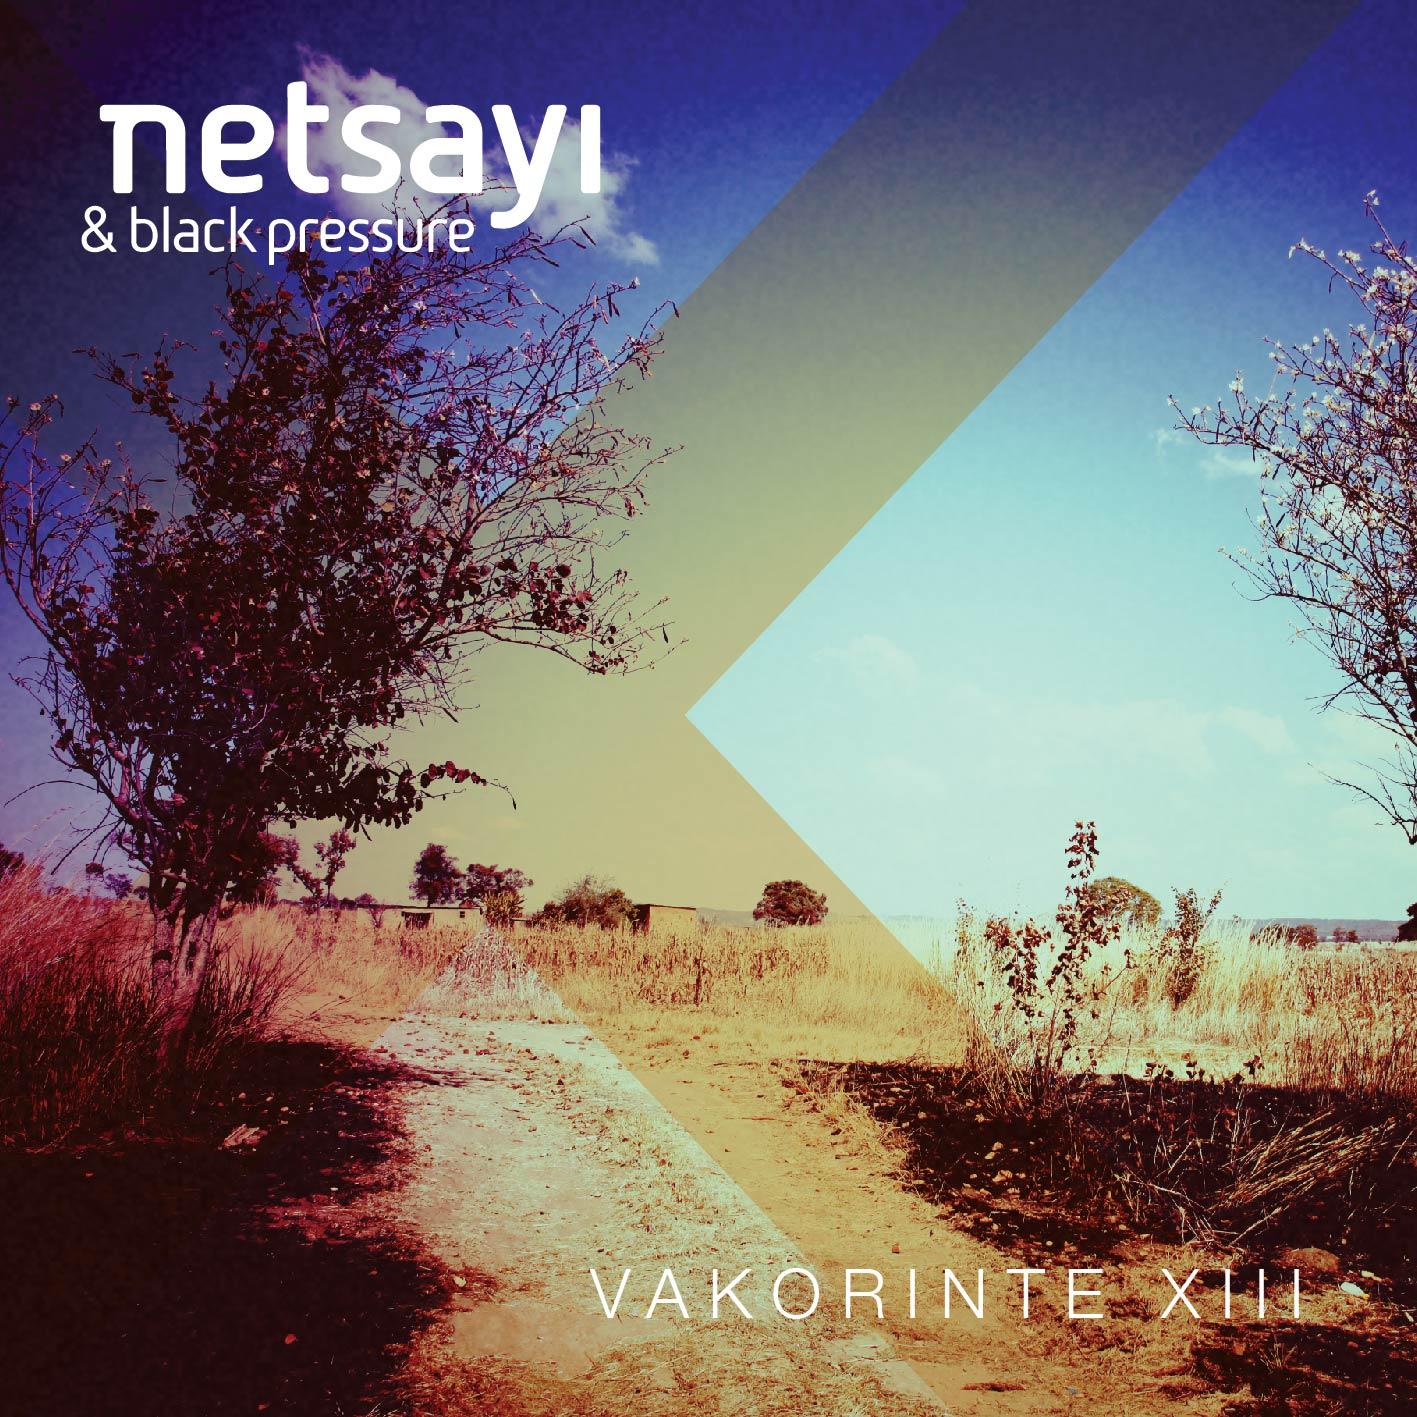 Vakorinte xiii (single)